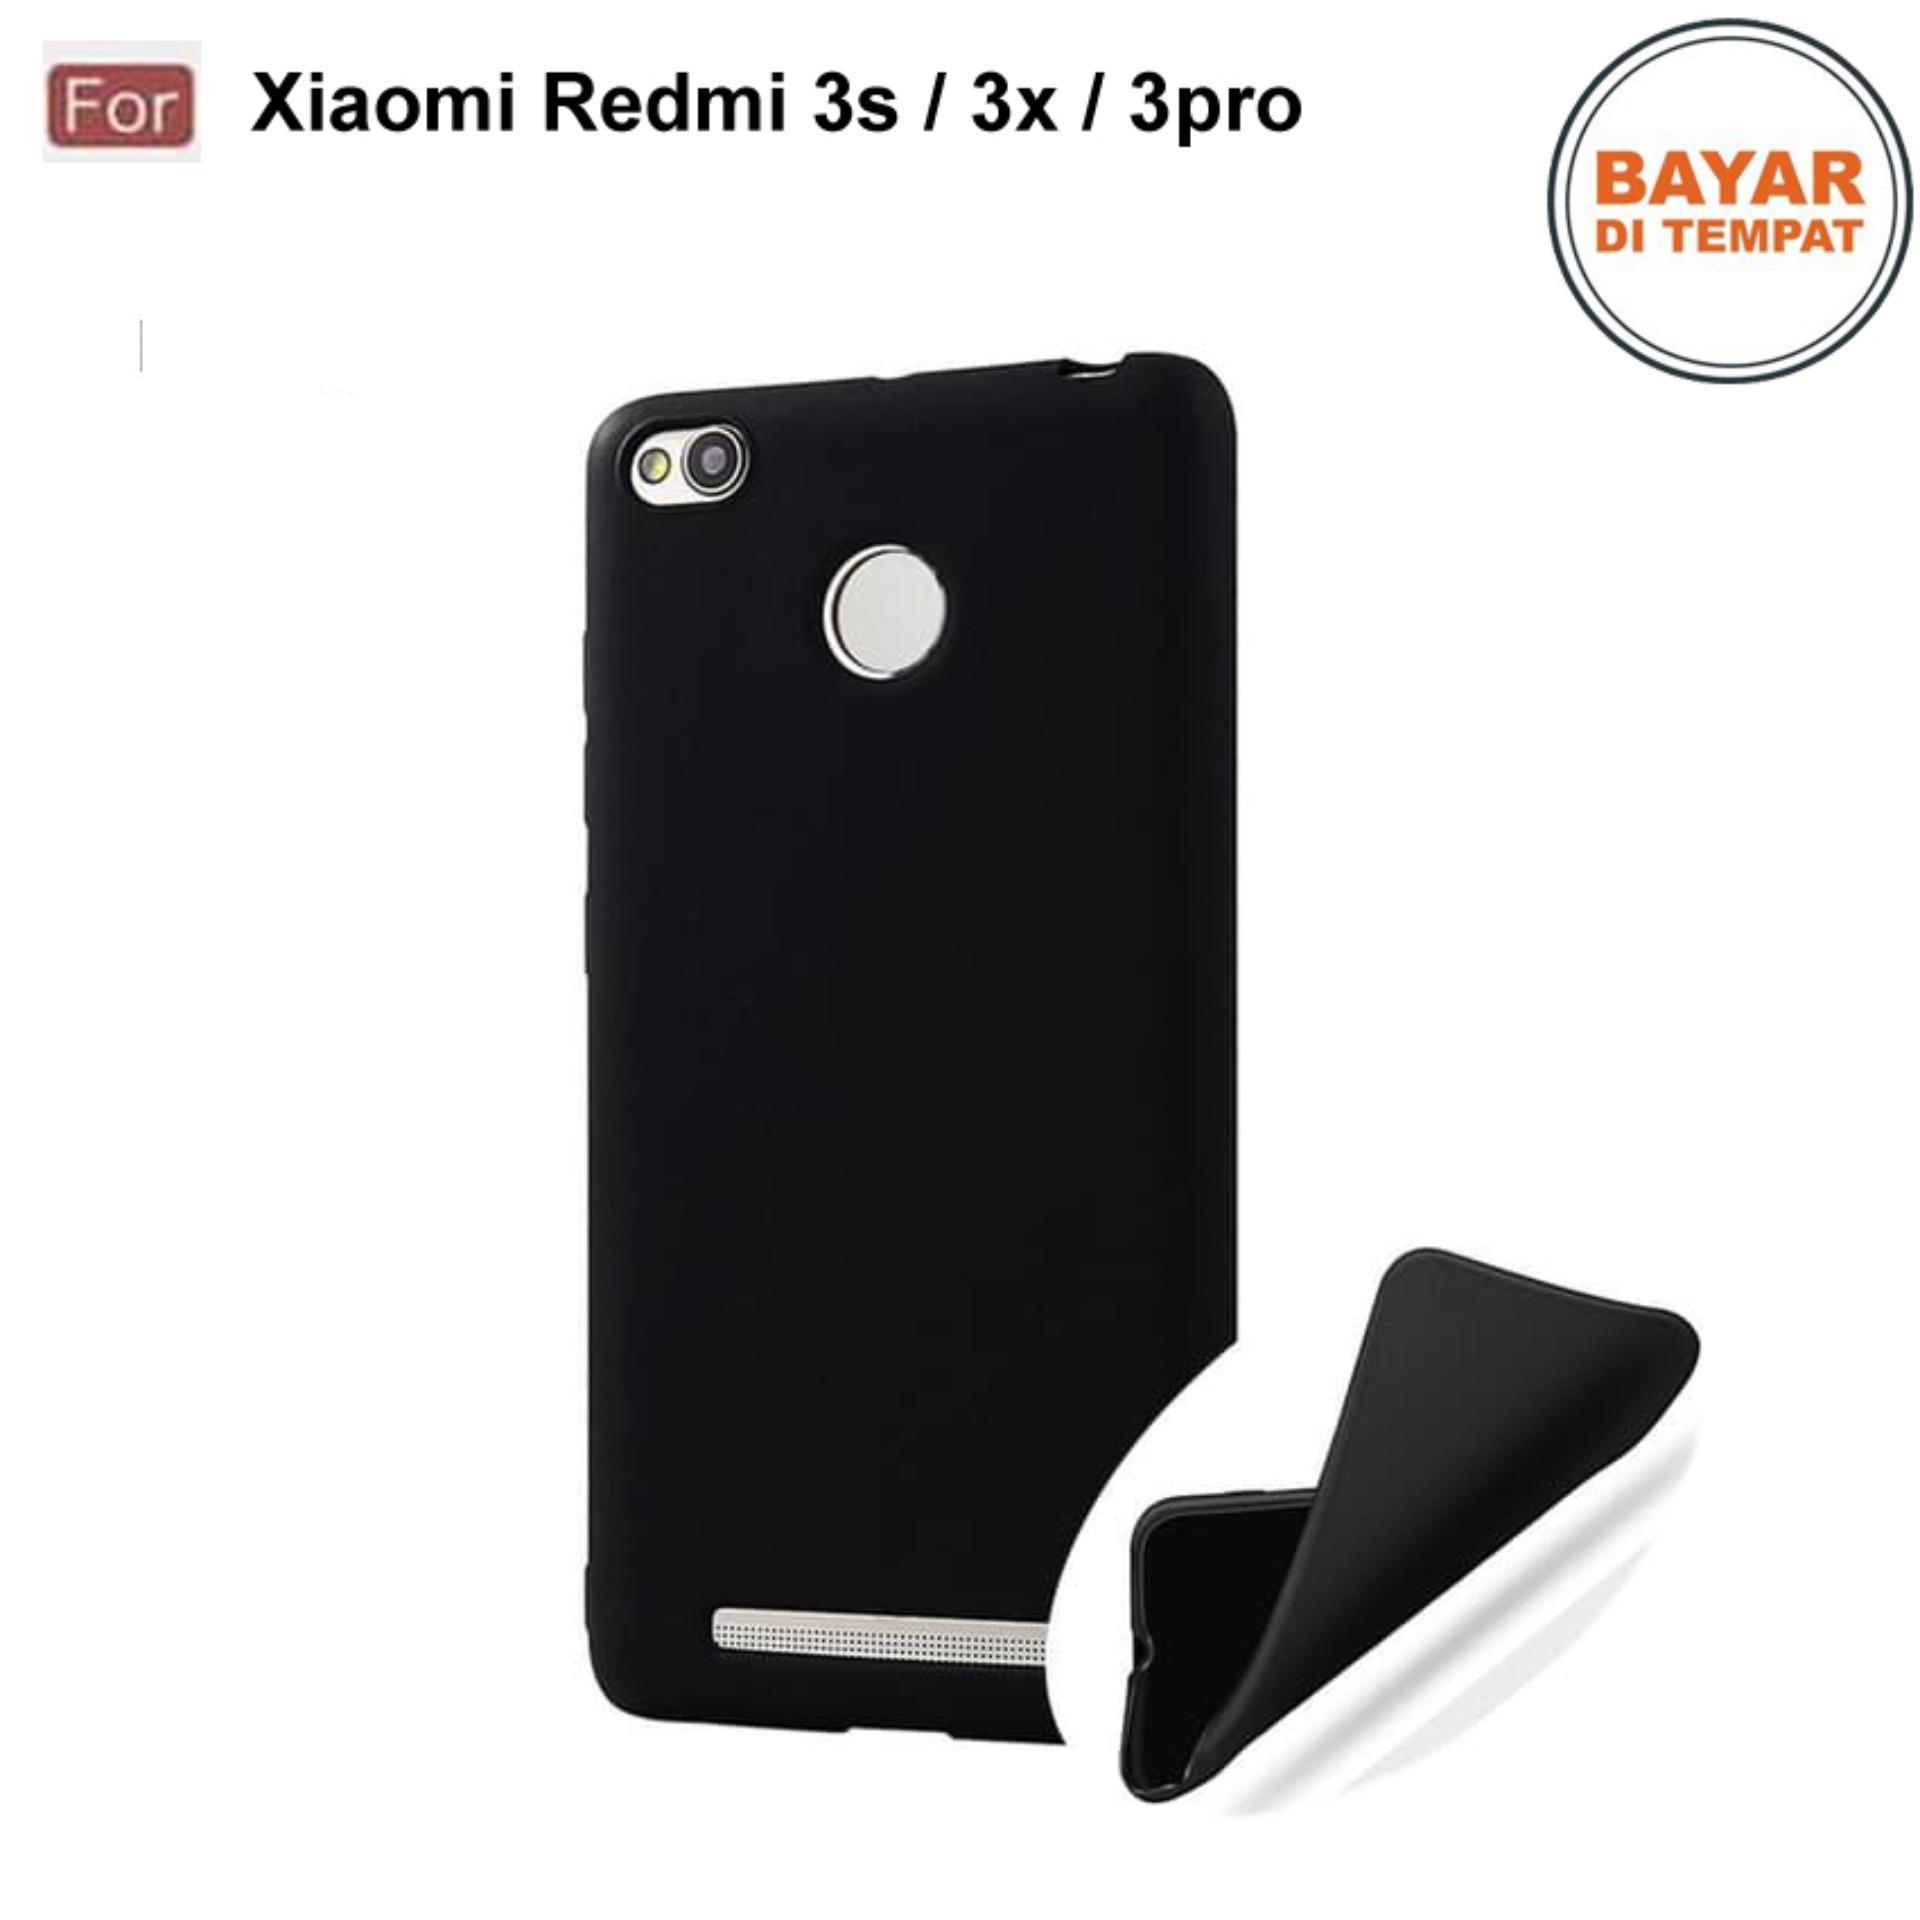 Case Baby skin elegant softcase ultraslim Casing Handphone Xiaomi Redmi 3s / 3x / 3pro